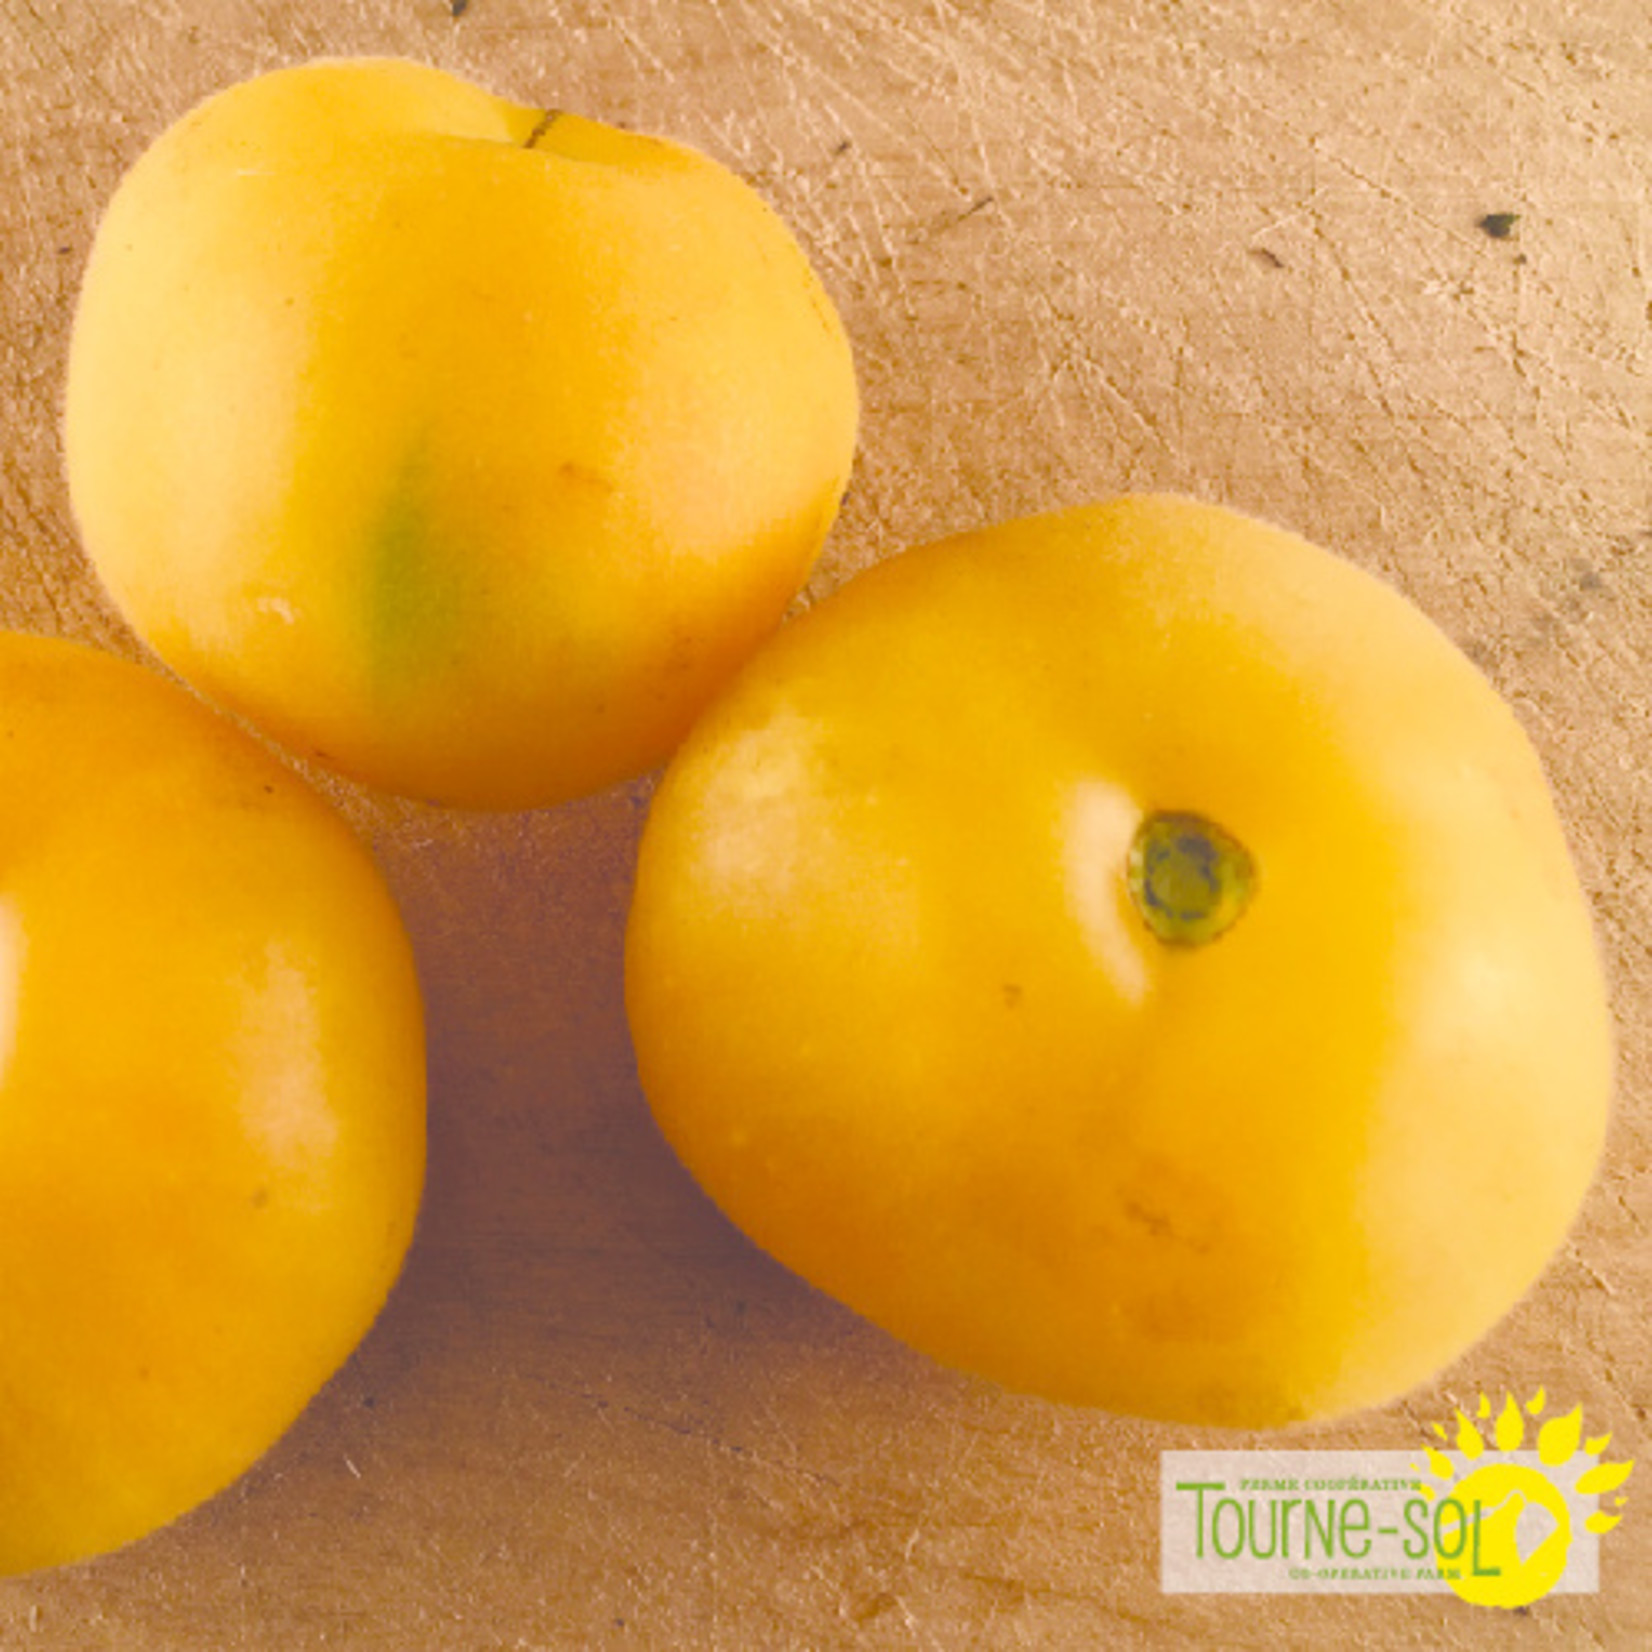 Tourne-Sol Tomate Jaune Wapsinicon Peach